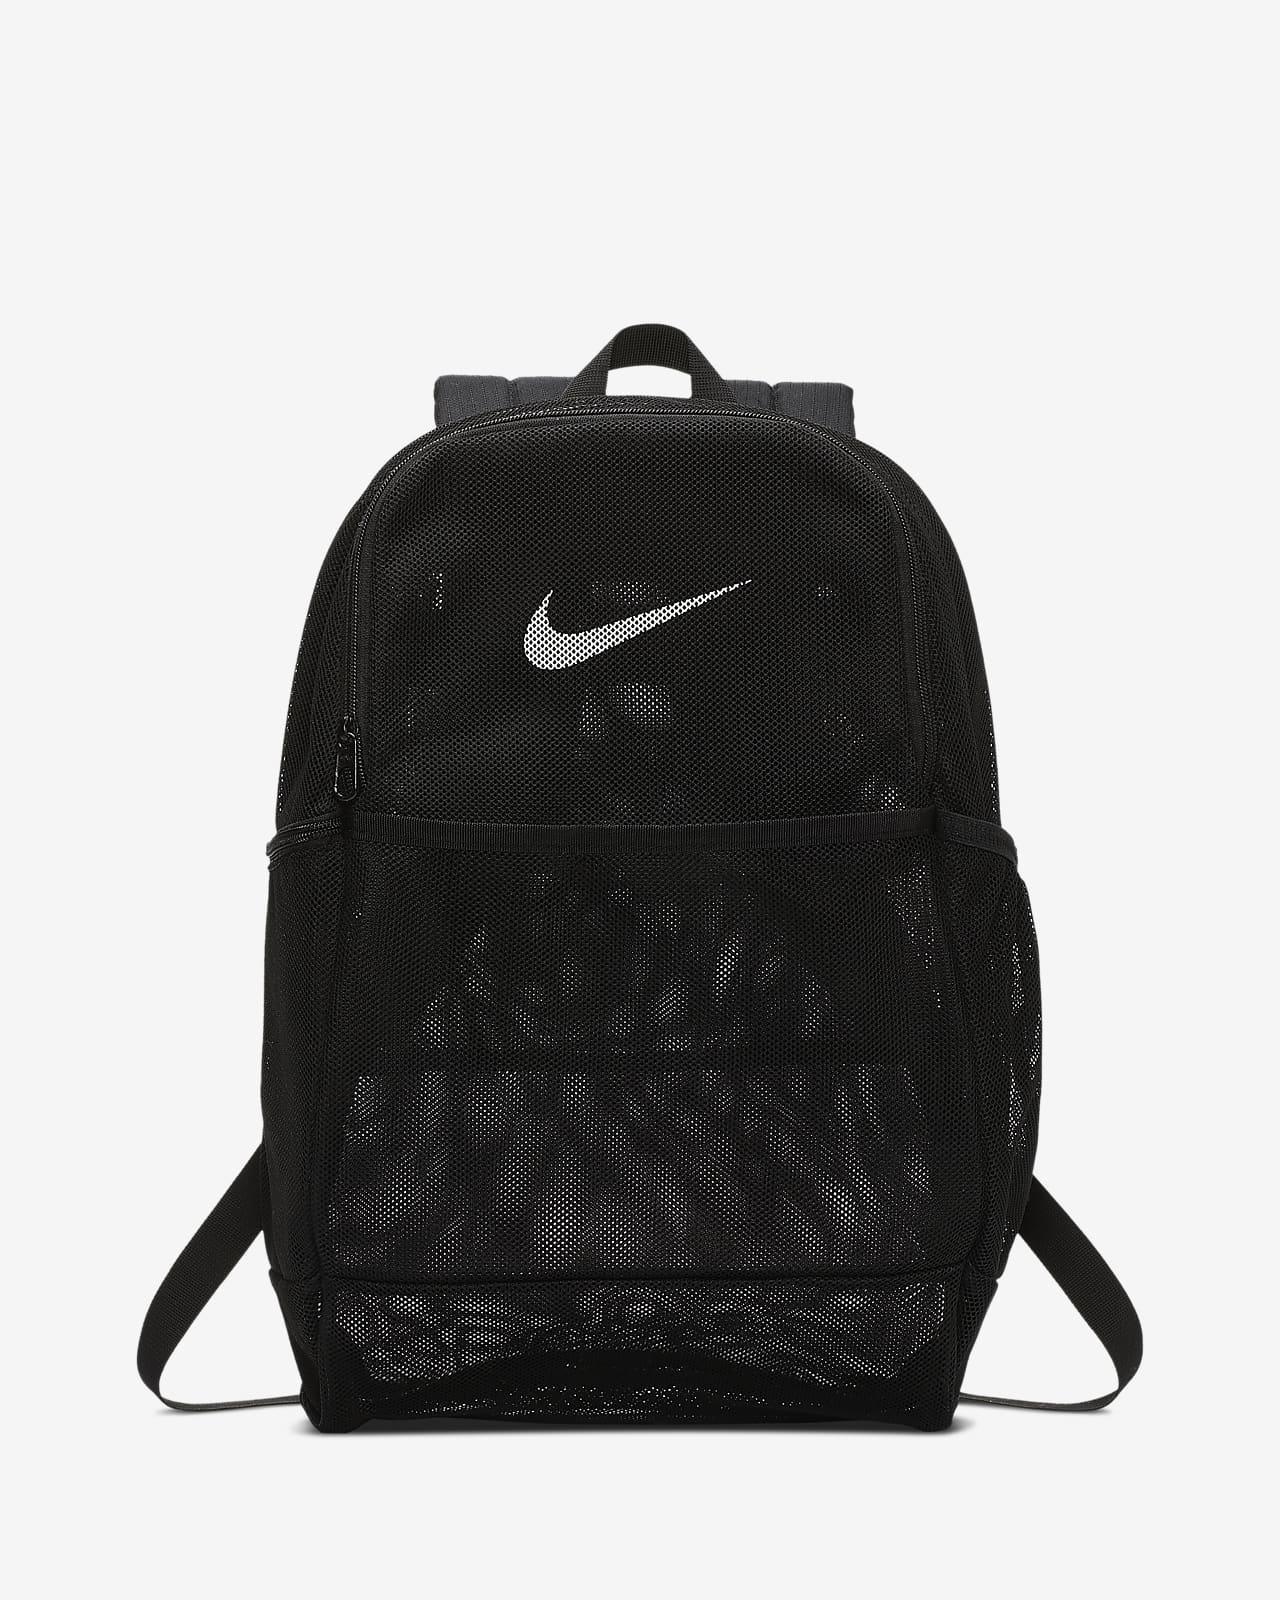 Nike Brasilia Mesh Training Backpack (26L)